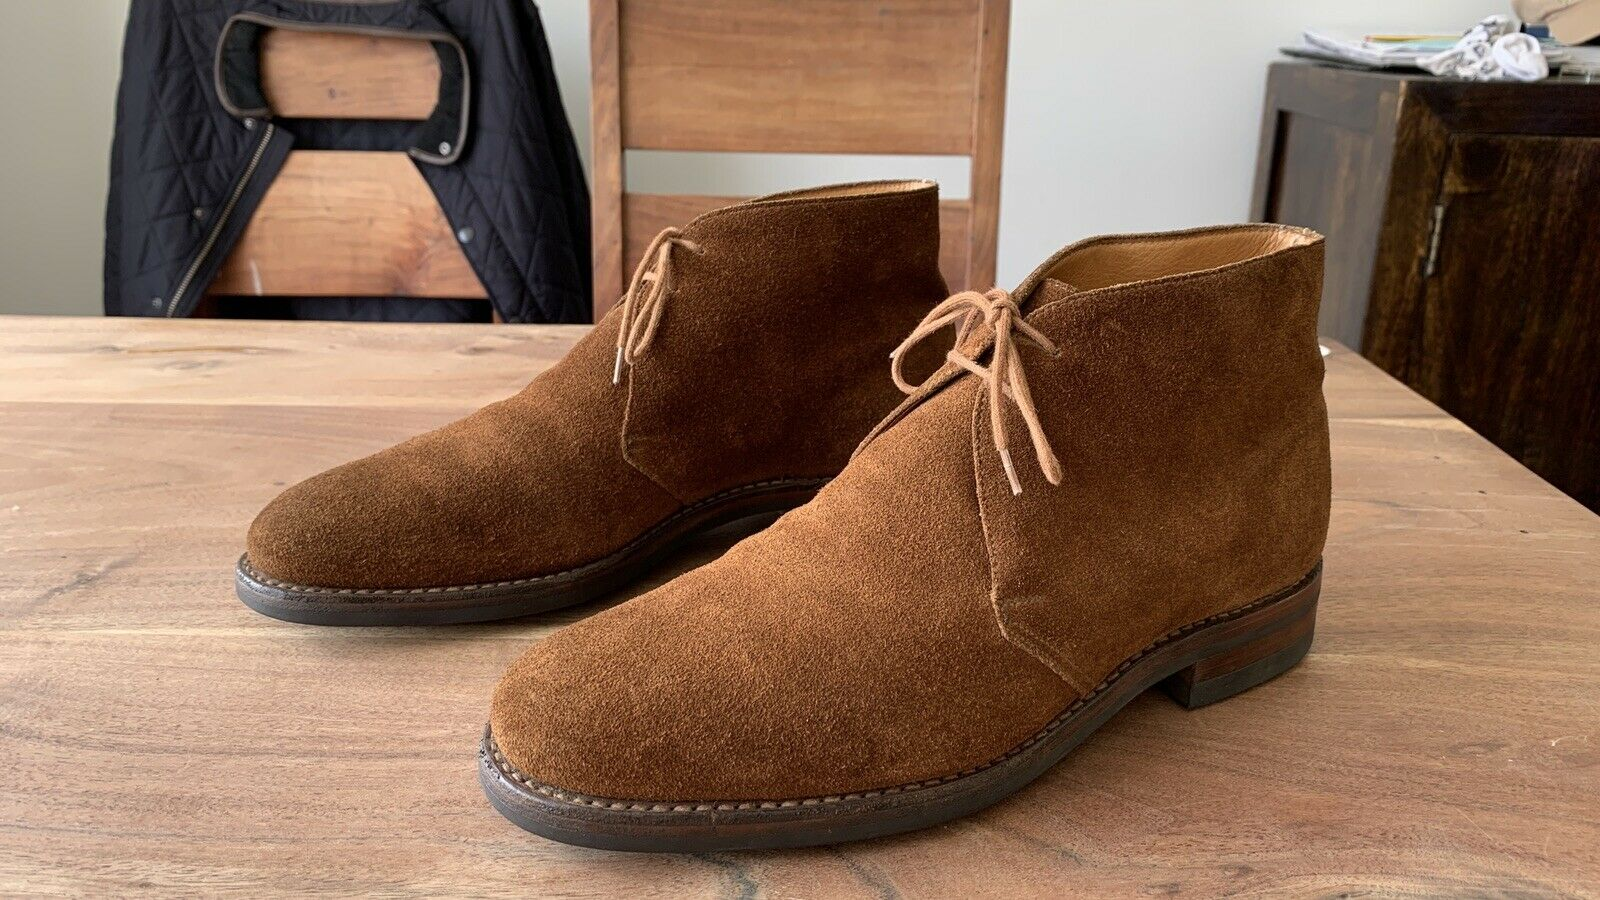 Crockett & Jones Chertsey Brown Suede Leather Chukka Boots UK8.5E Made In Eng